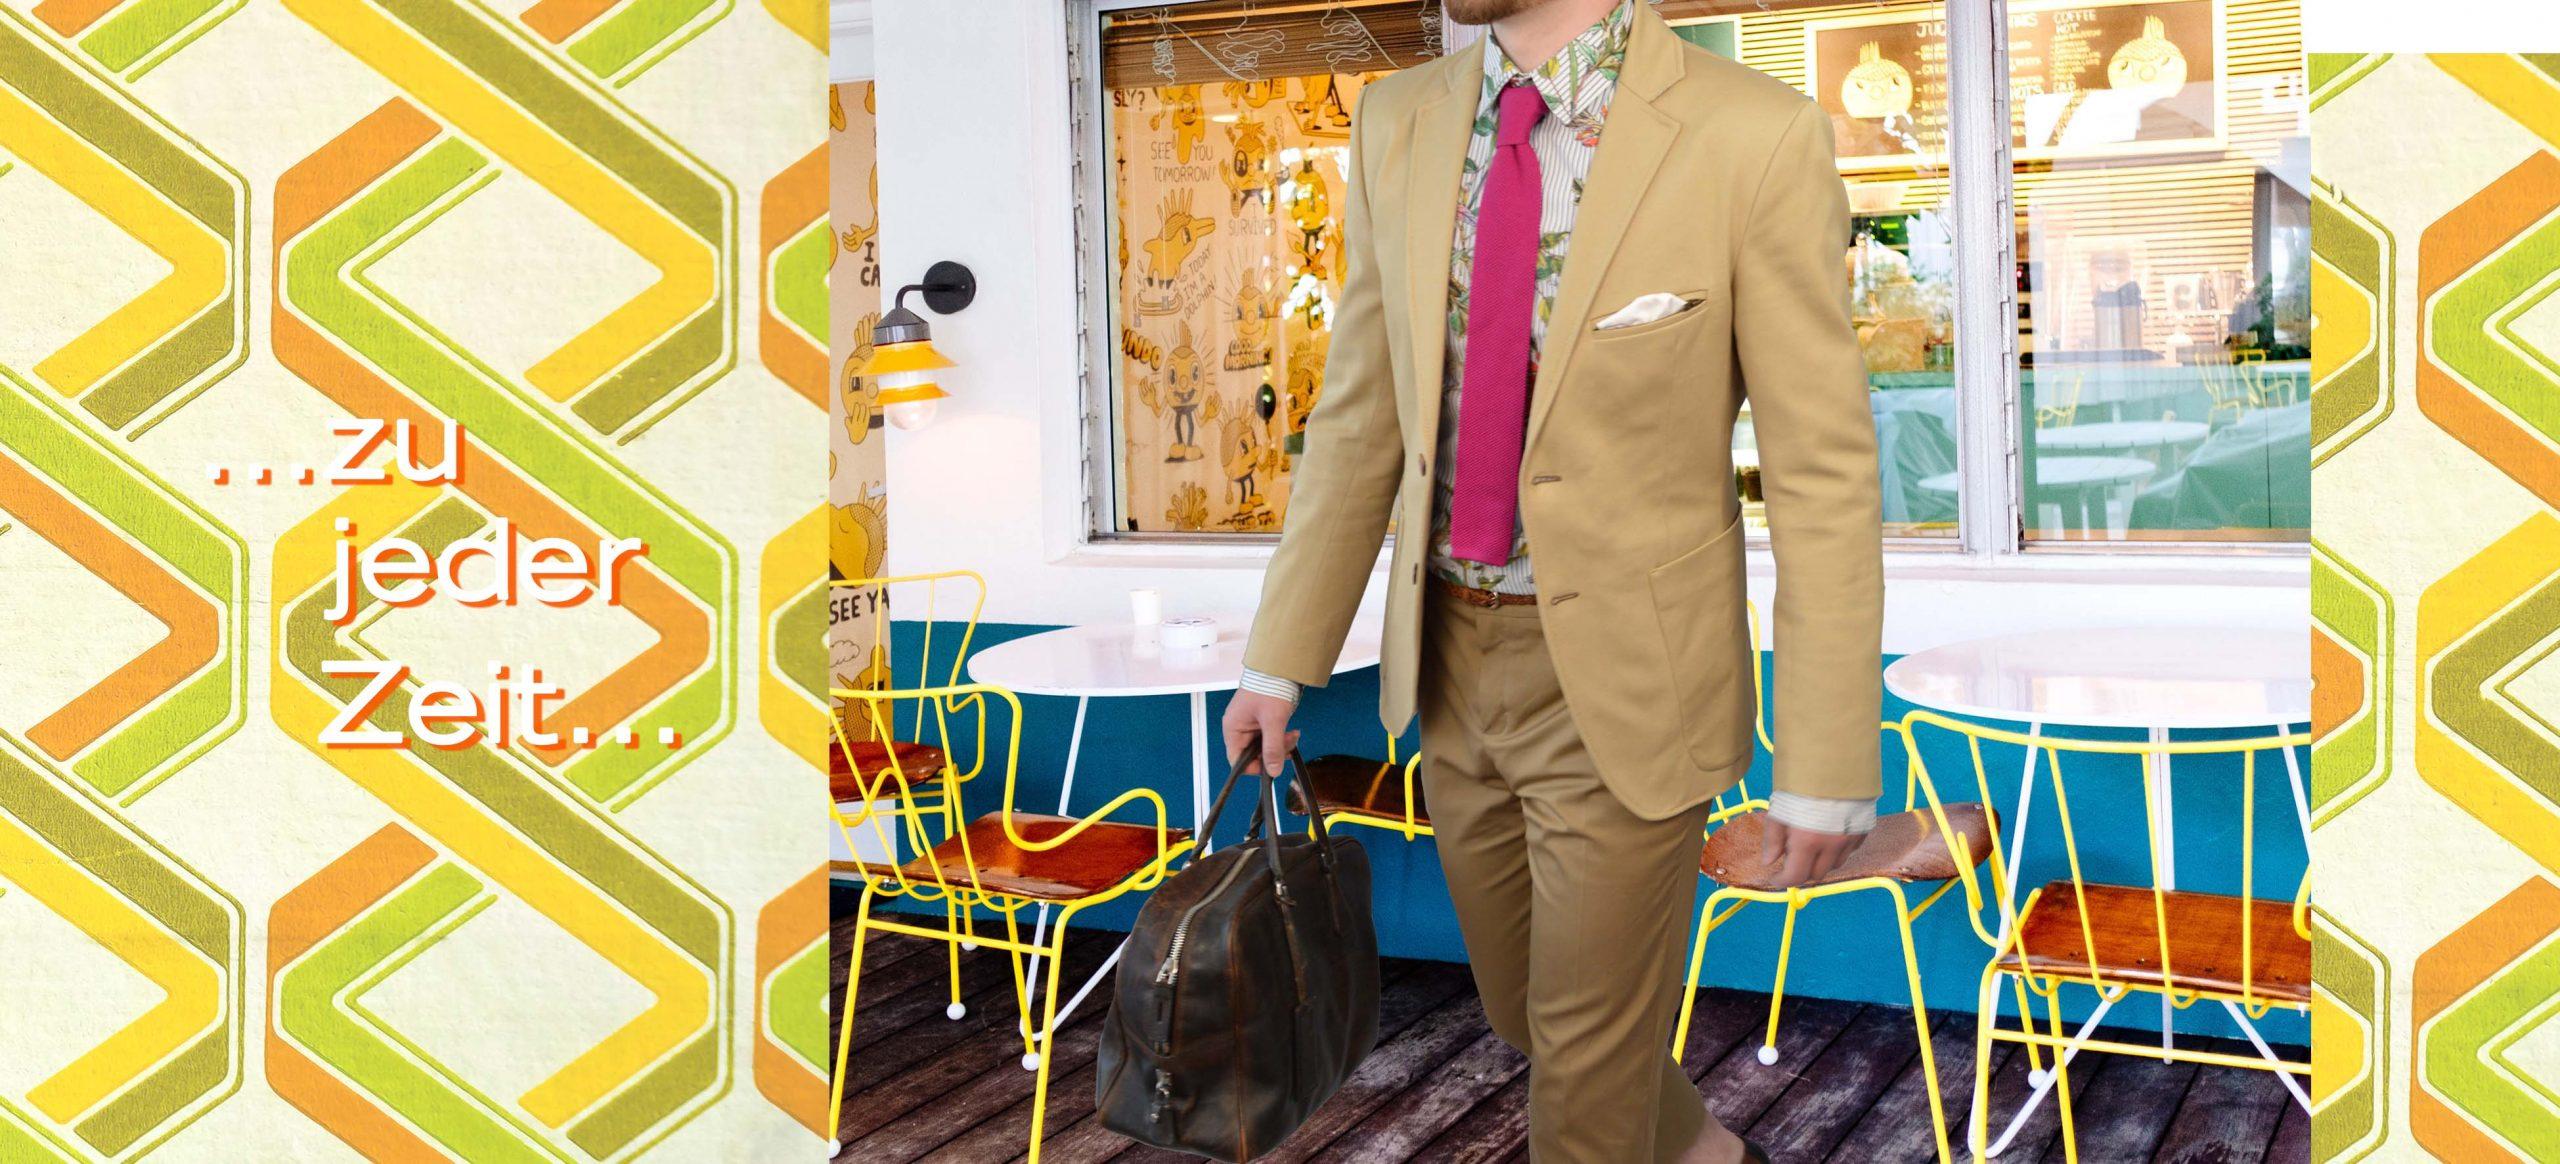 oliver_kresse-modedesign-hamburg-streetstyle-fashion-cooles_outfit